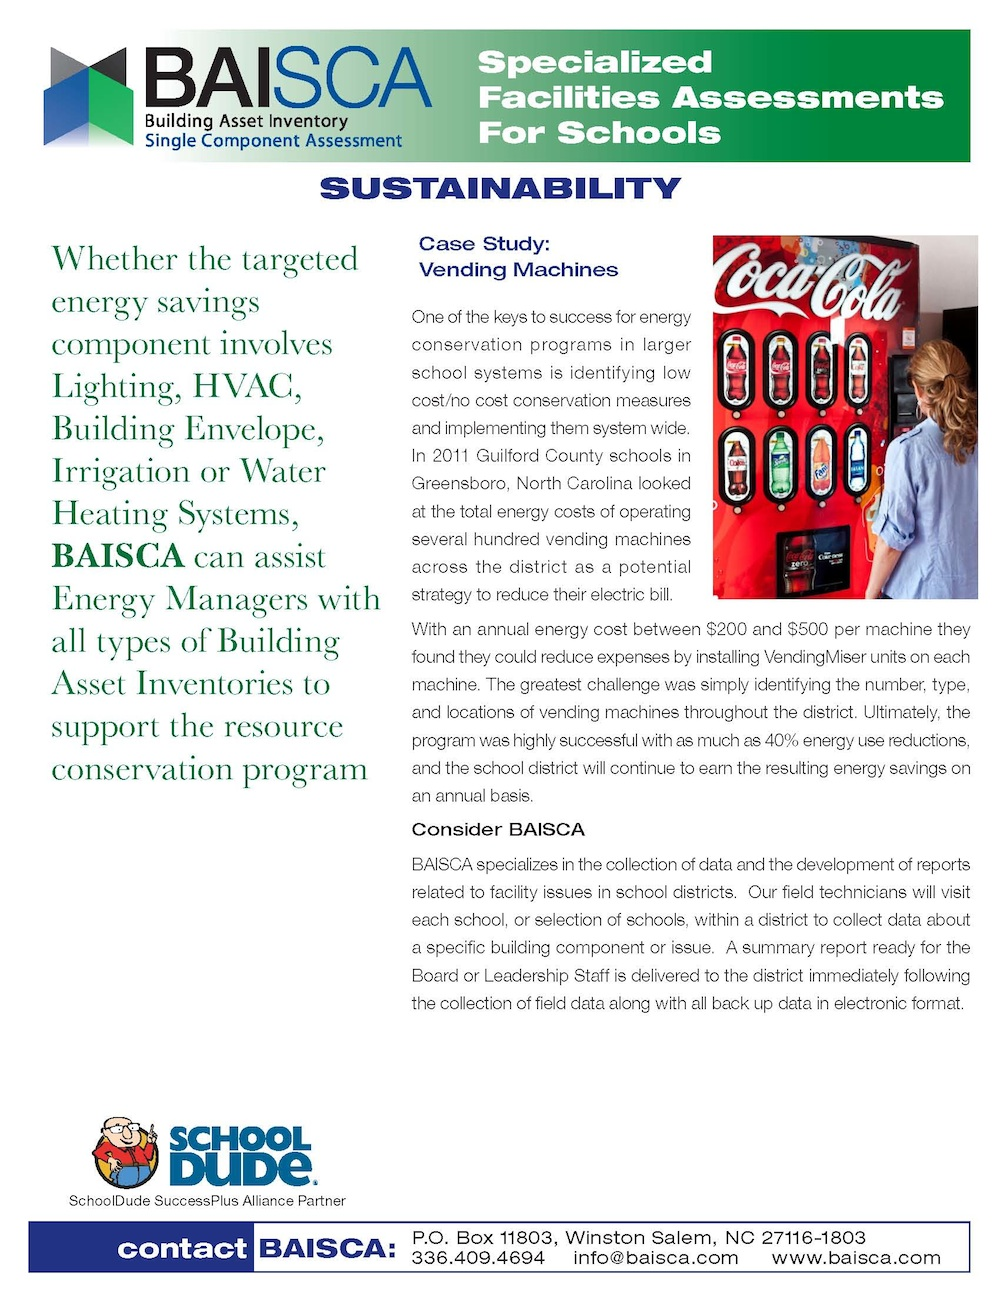 BAISCA_Sustainability_1000